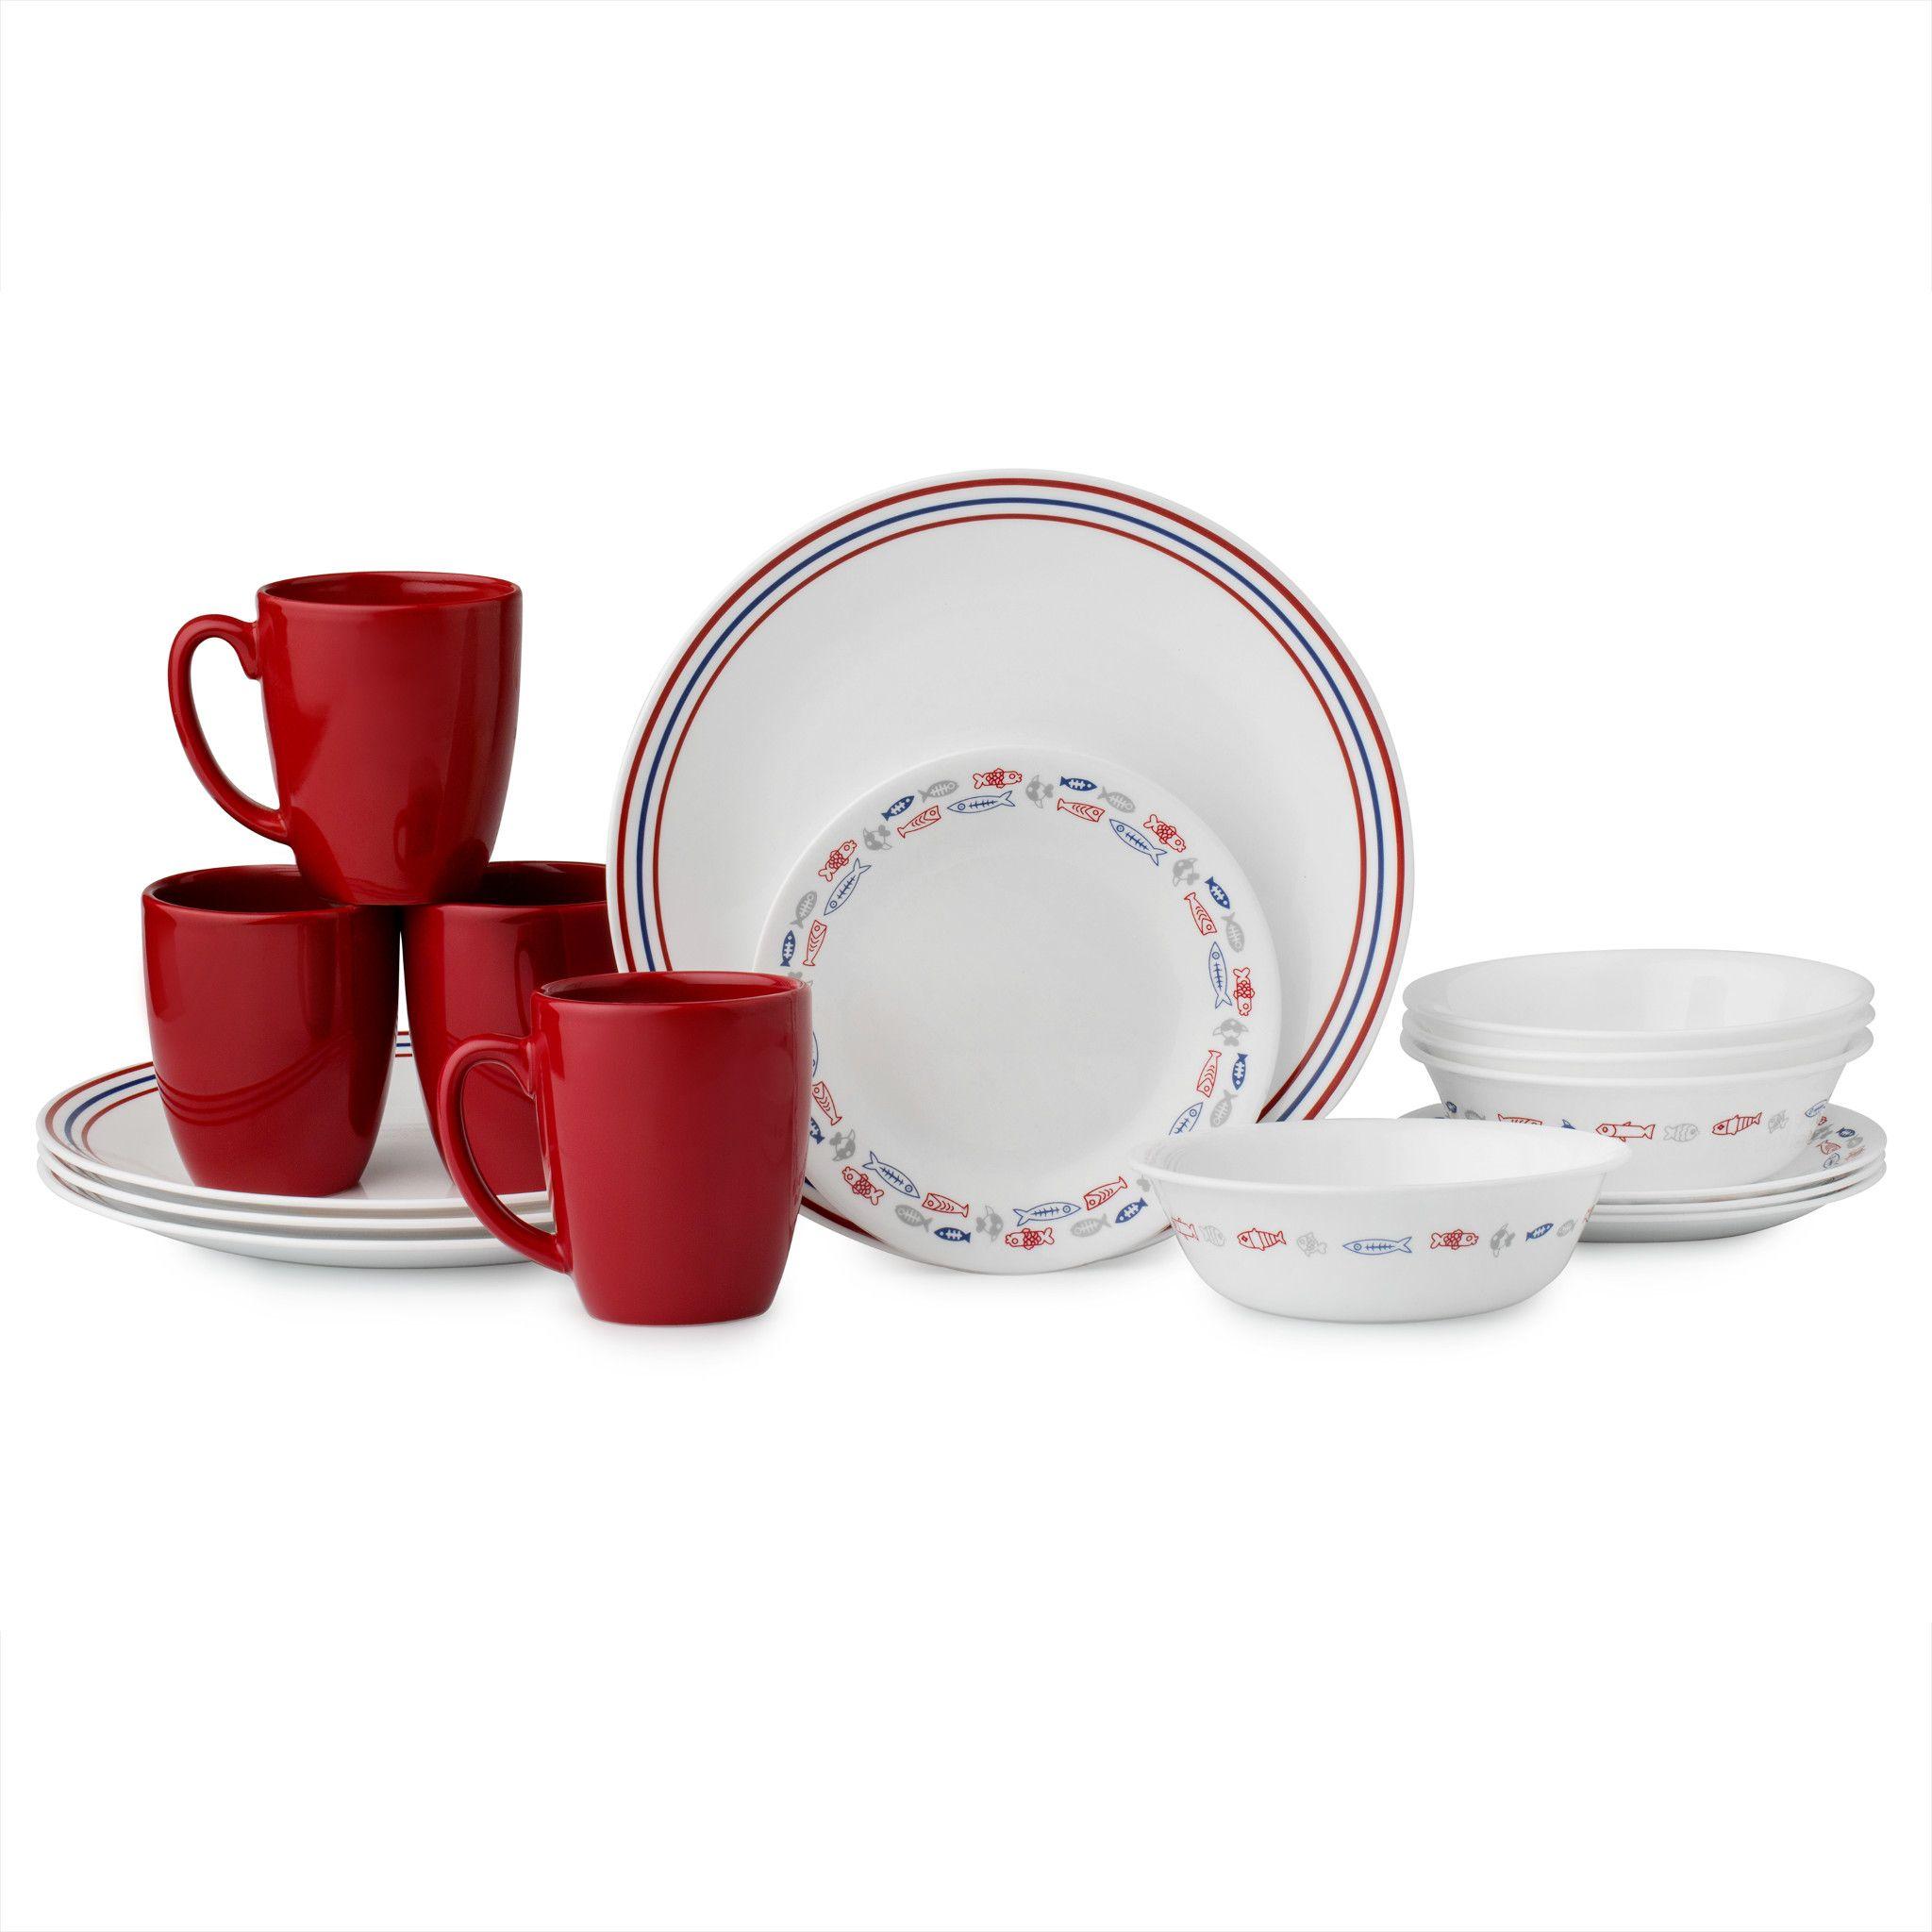 Livingware™ Harbor Town 16-pc Dinnerware Set